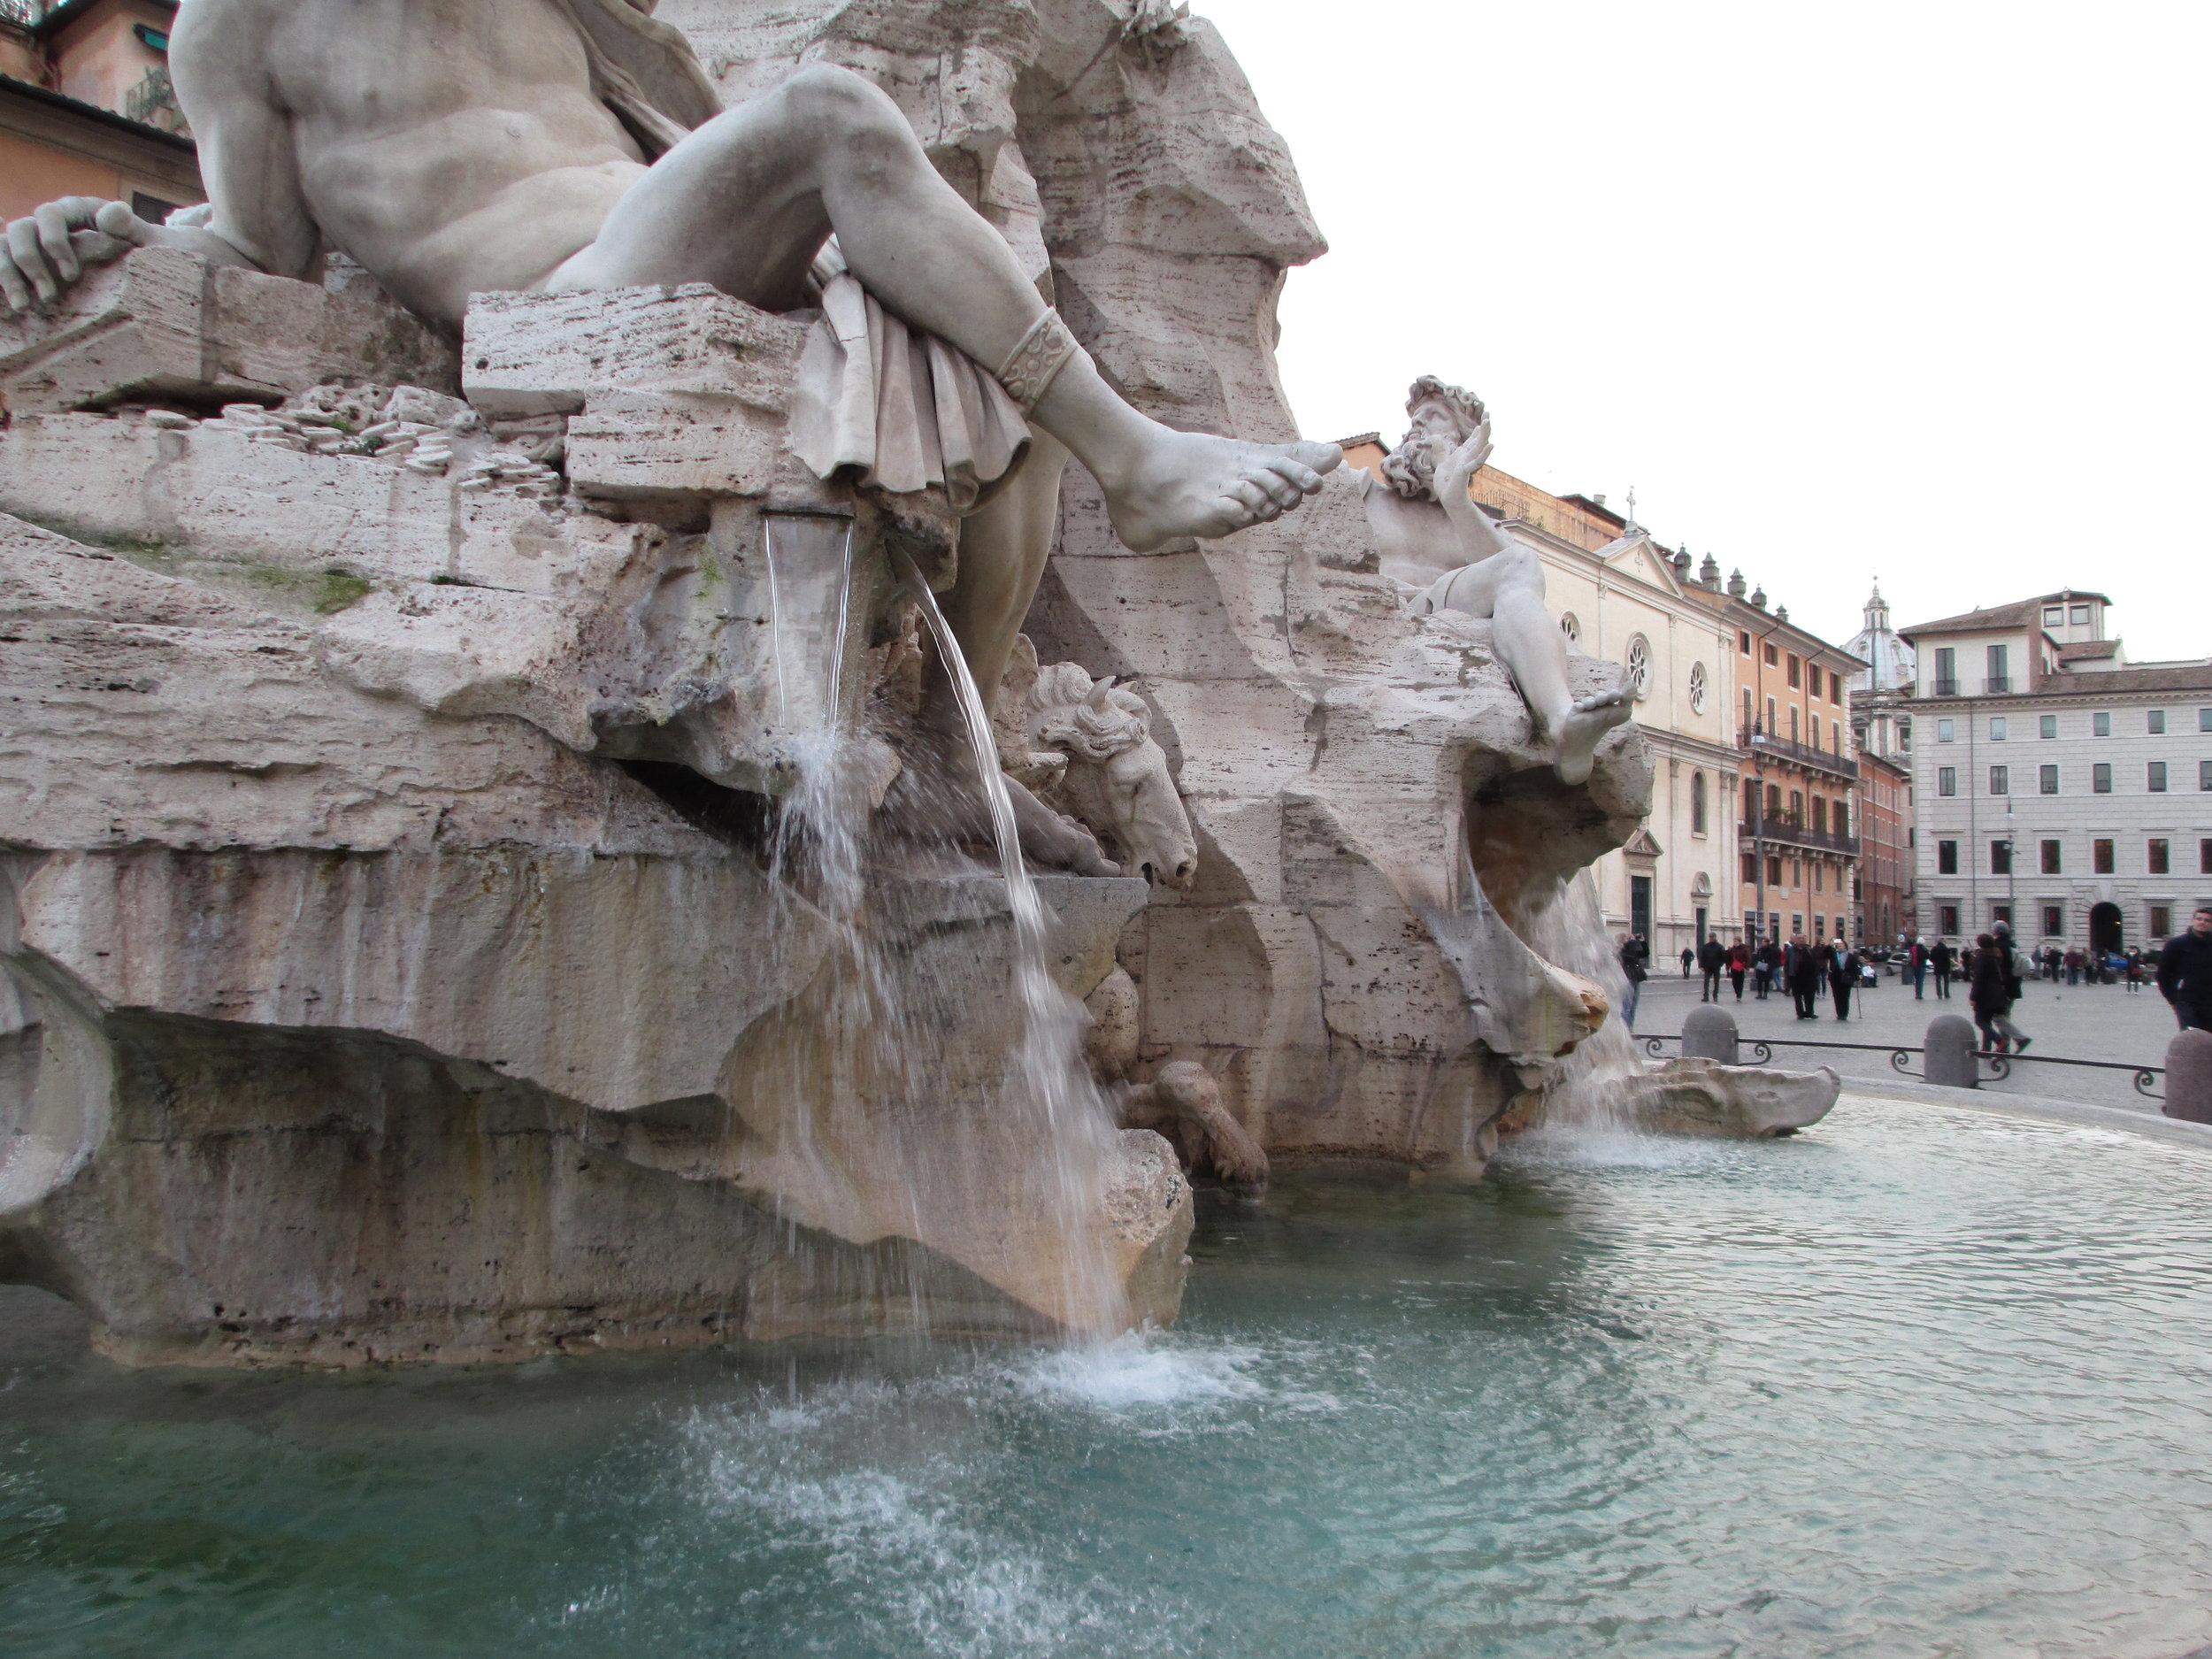 OB19 Plaza Navona Bernini statue Fountain of the Four Rivers(detail).JPG